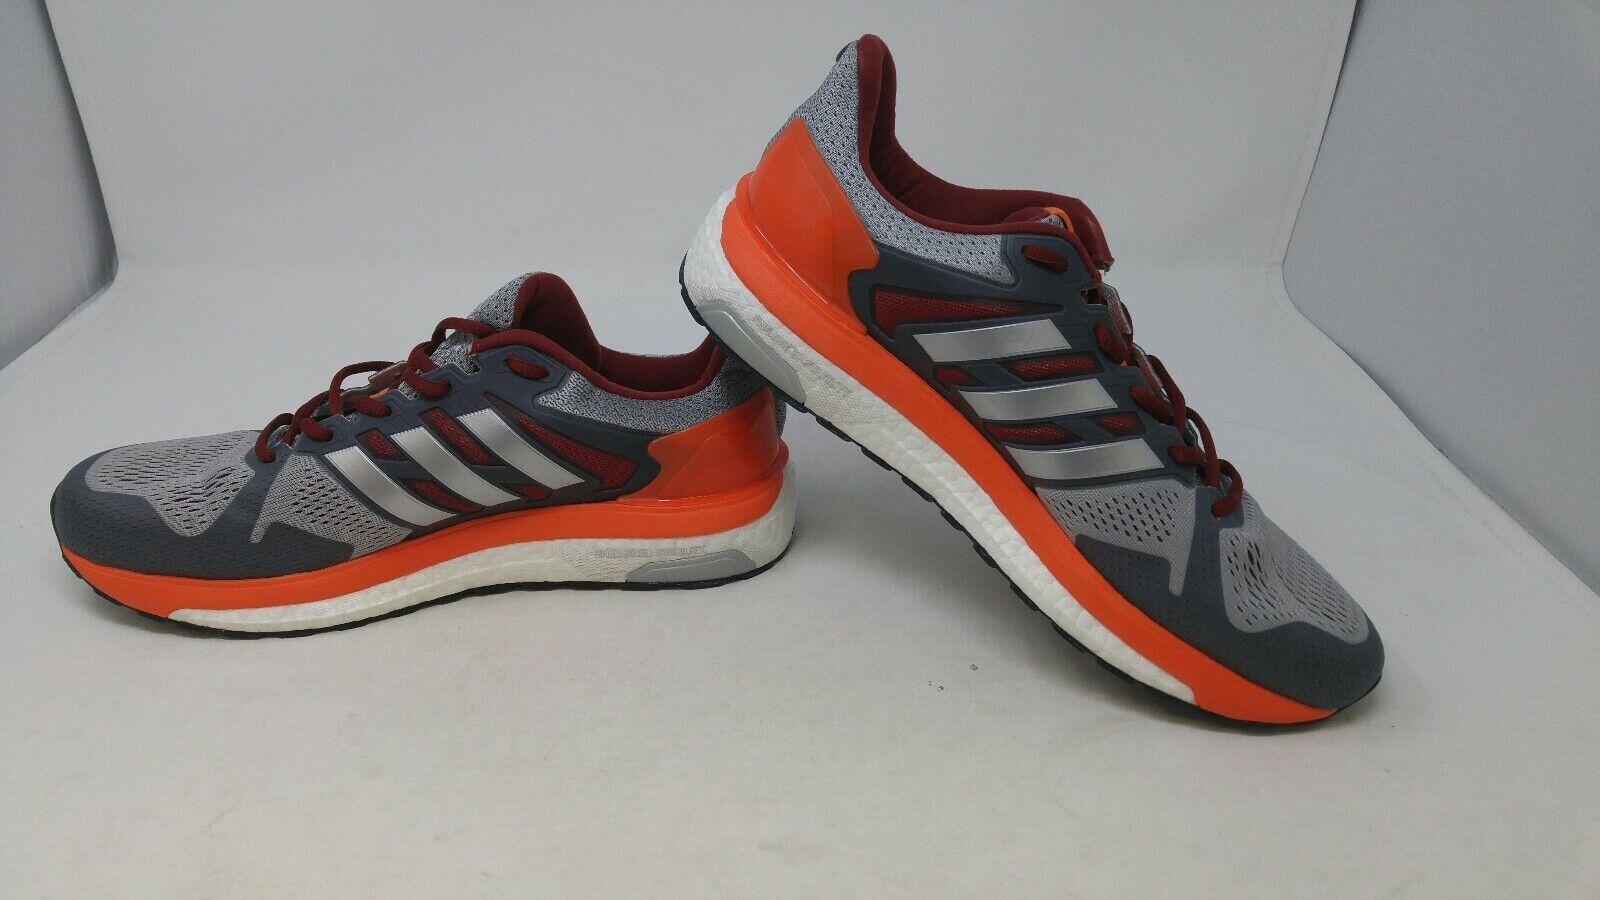 Adidas Mens Running shoes Grey red orange Size 10.5